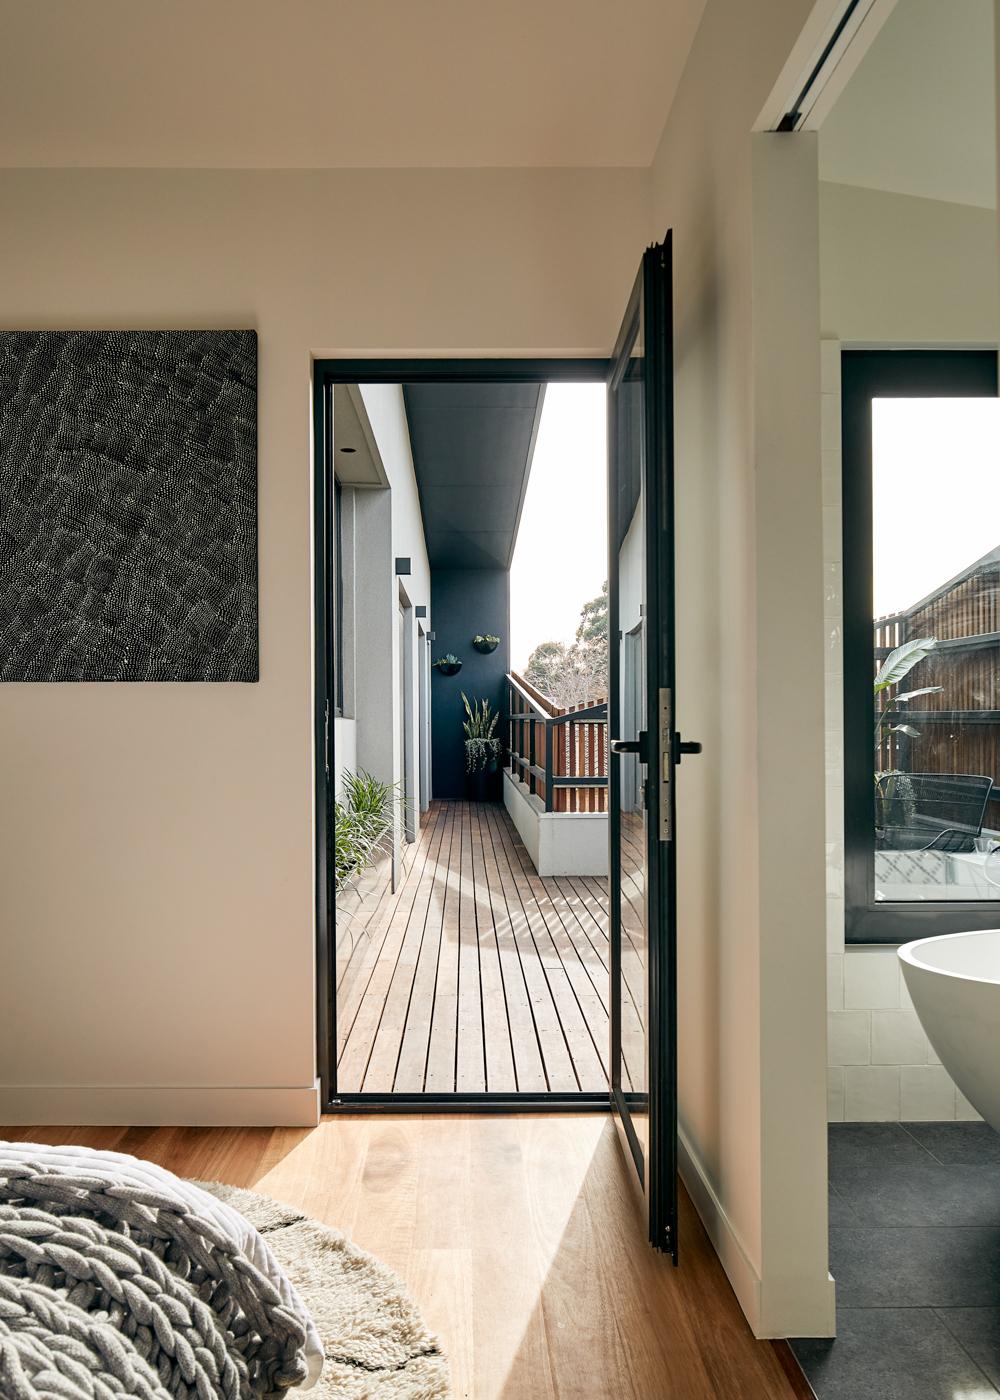 Architects and Design in Australia